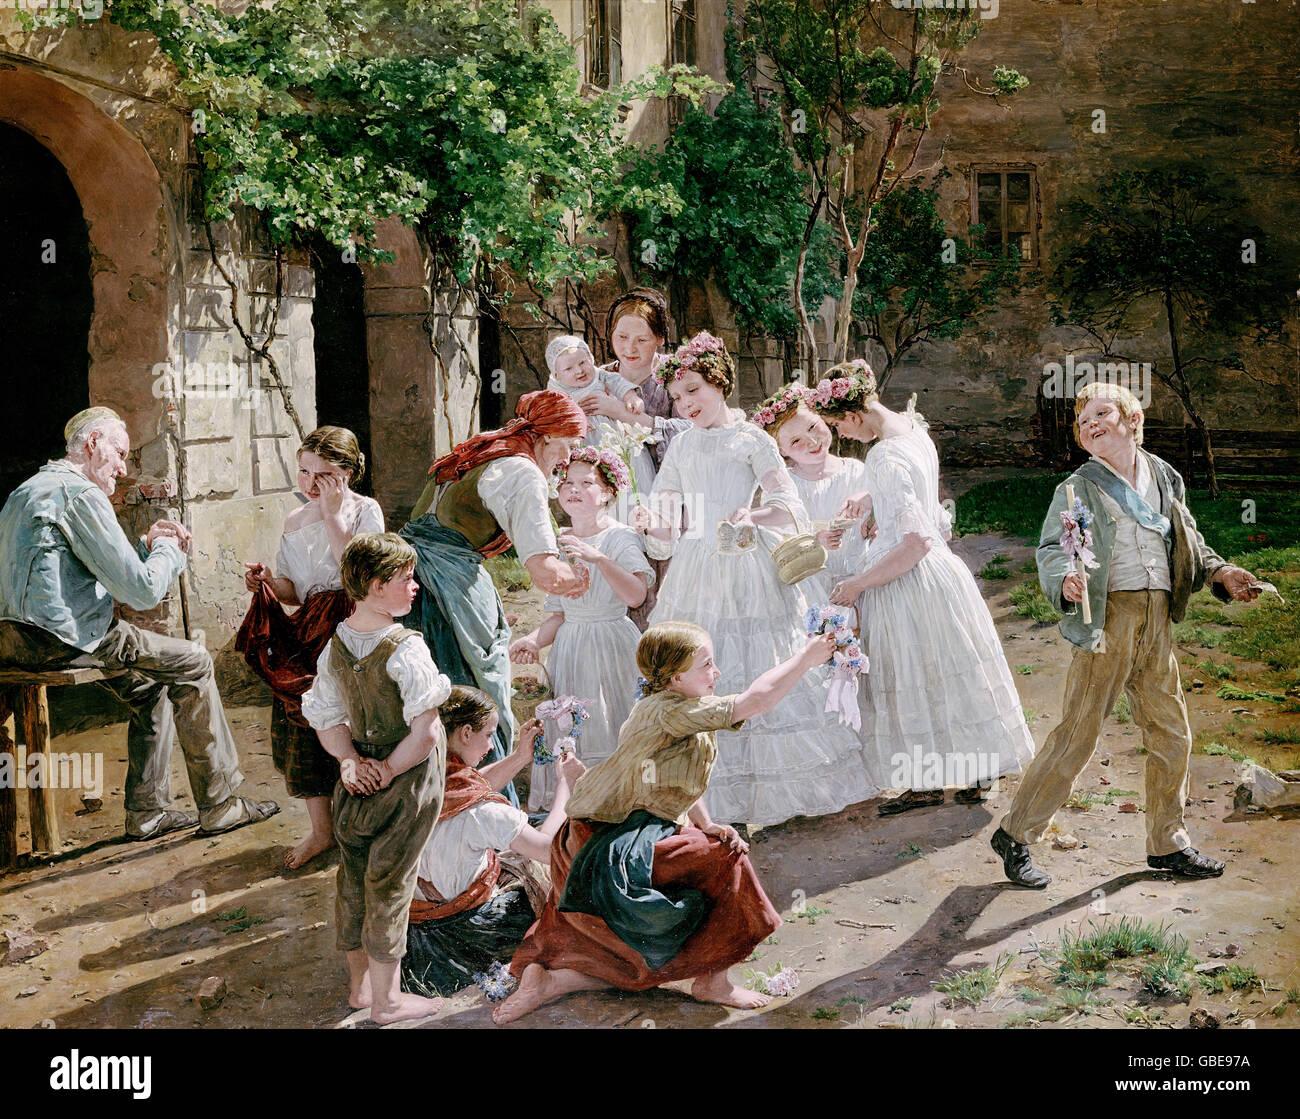 fine arts, Waldmueller, Ferdinand Georg (1793 - 1865), painting, 'Am Fronleichnamsmorgen' (Feast of Corpus - Stock Image